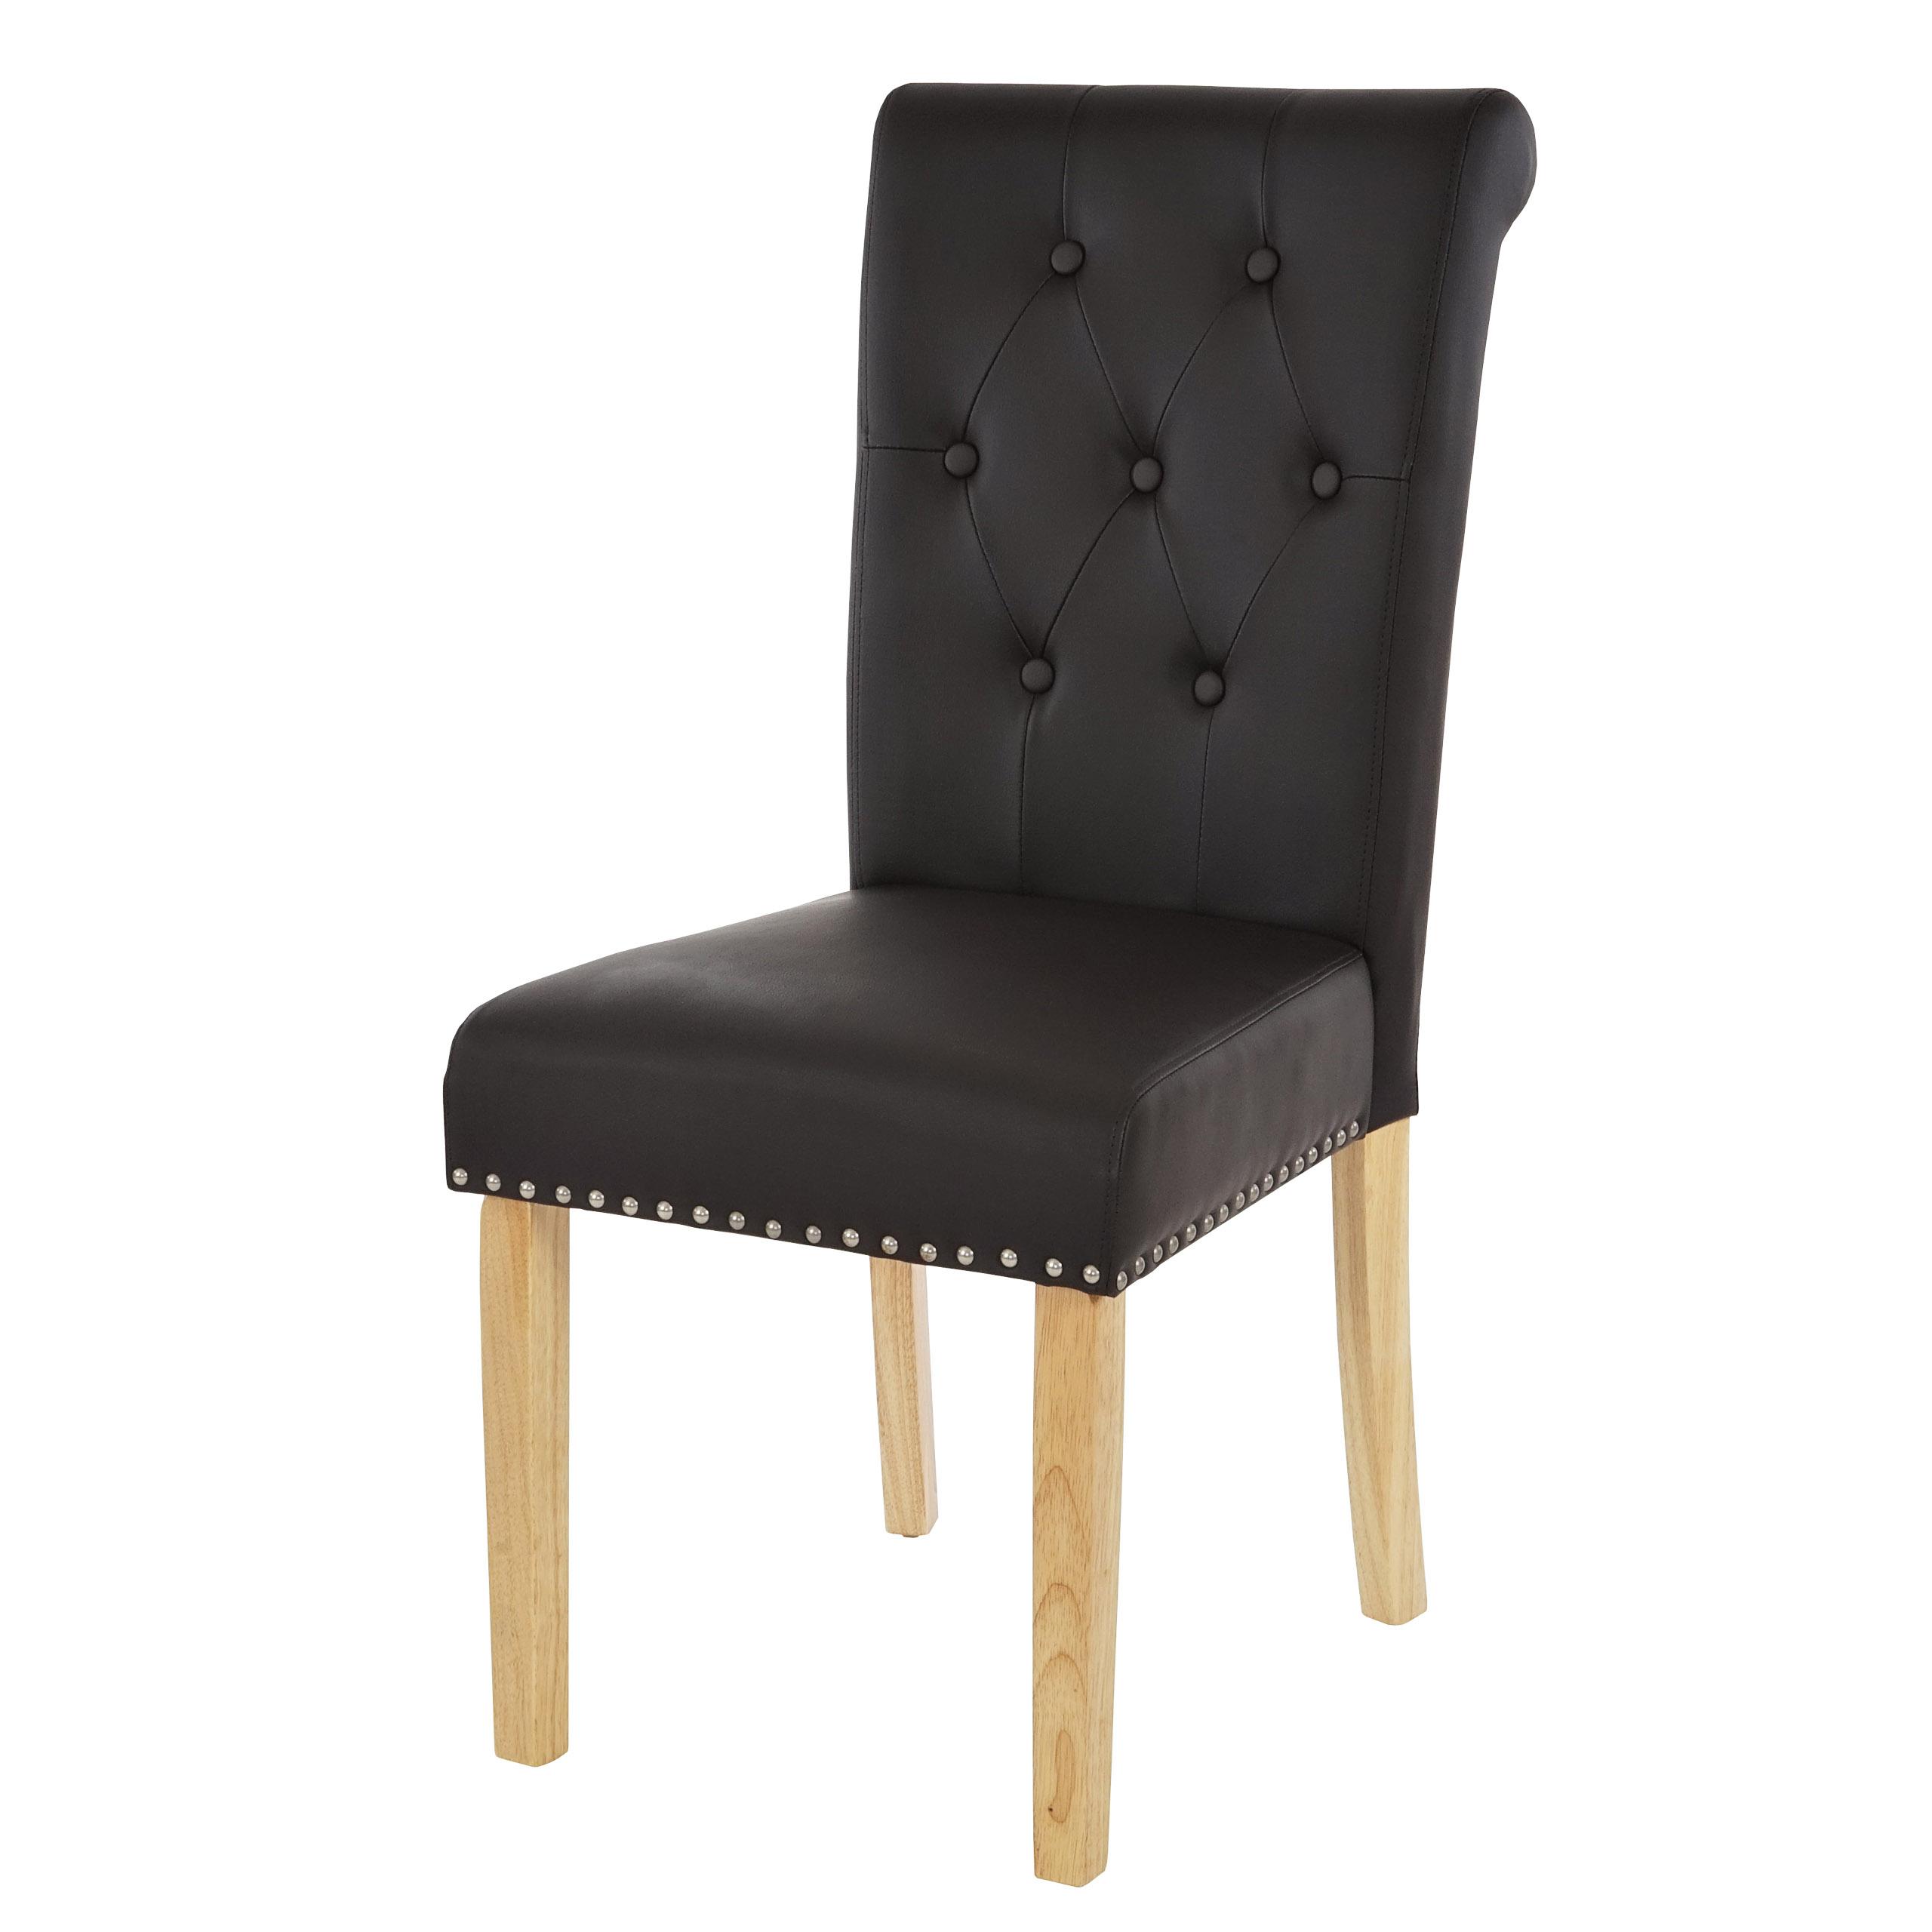 2x esszimmerstuhl chesterfield ii stuhl lehnstuhl nieten kunstleder coffee helle beine. Black Bedroom Furniture Sets. Home Design Ideas